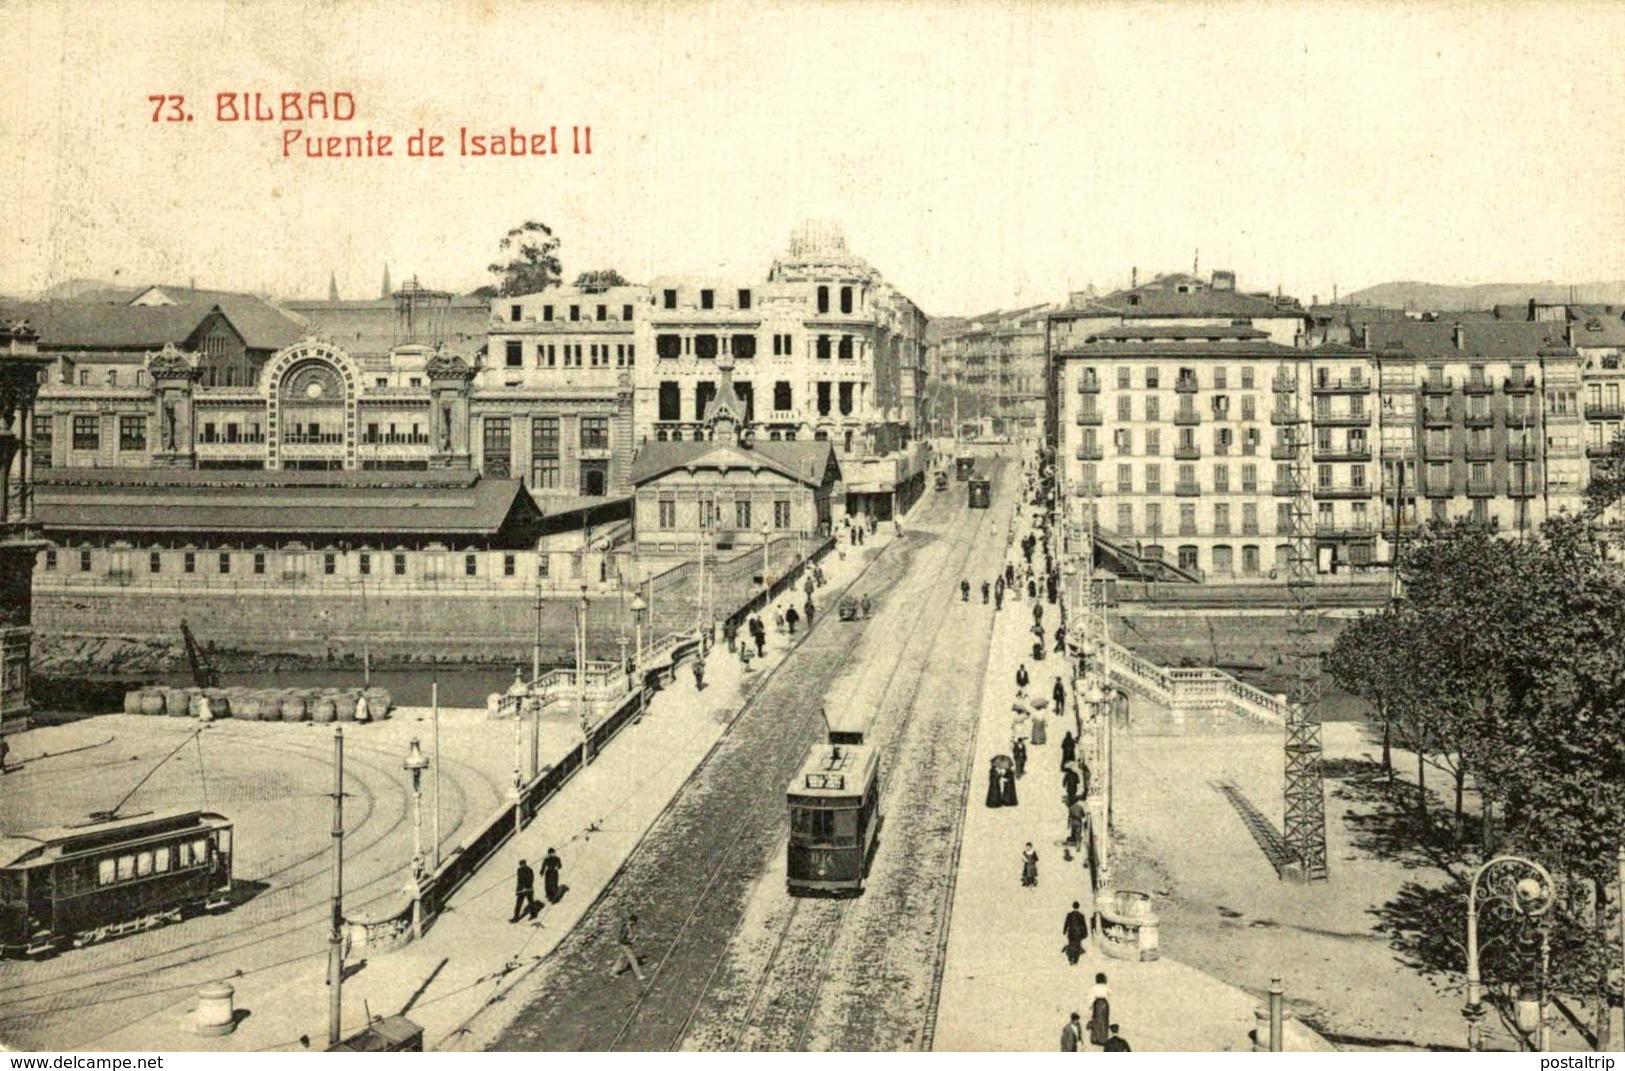 BILBAO PUENTE DE ISABEL II - Vizcaya (Bilbao)